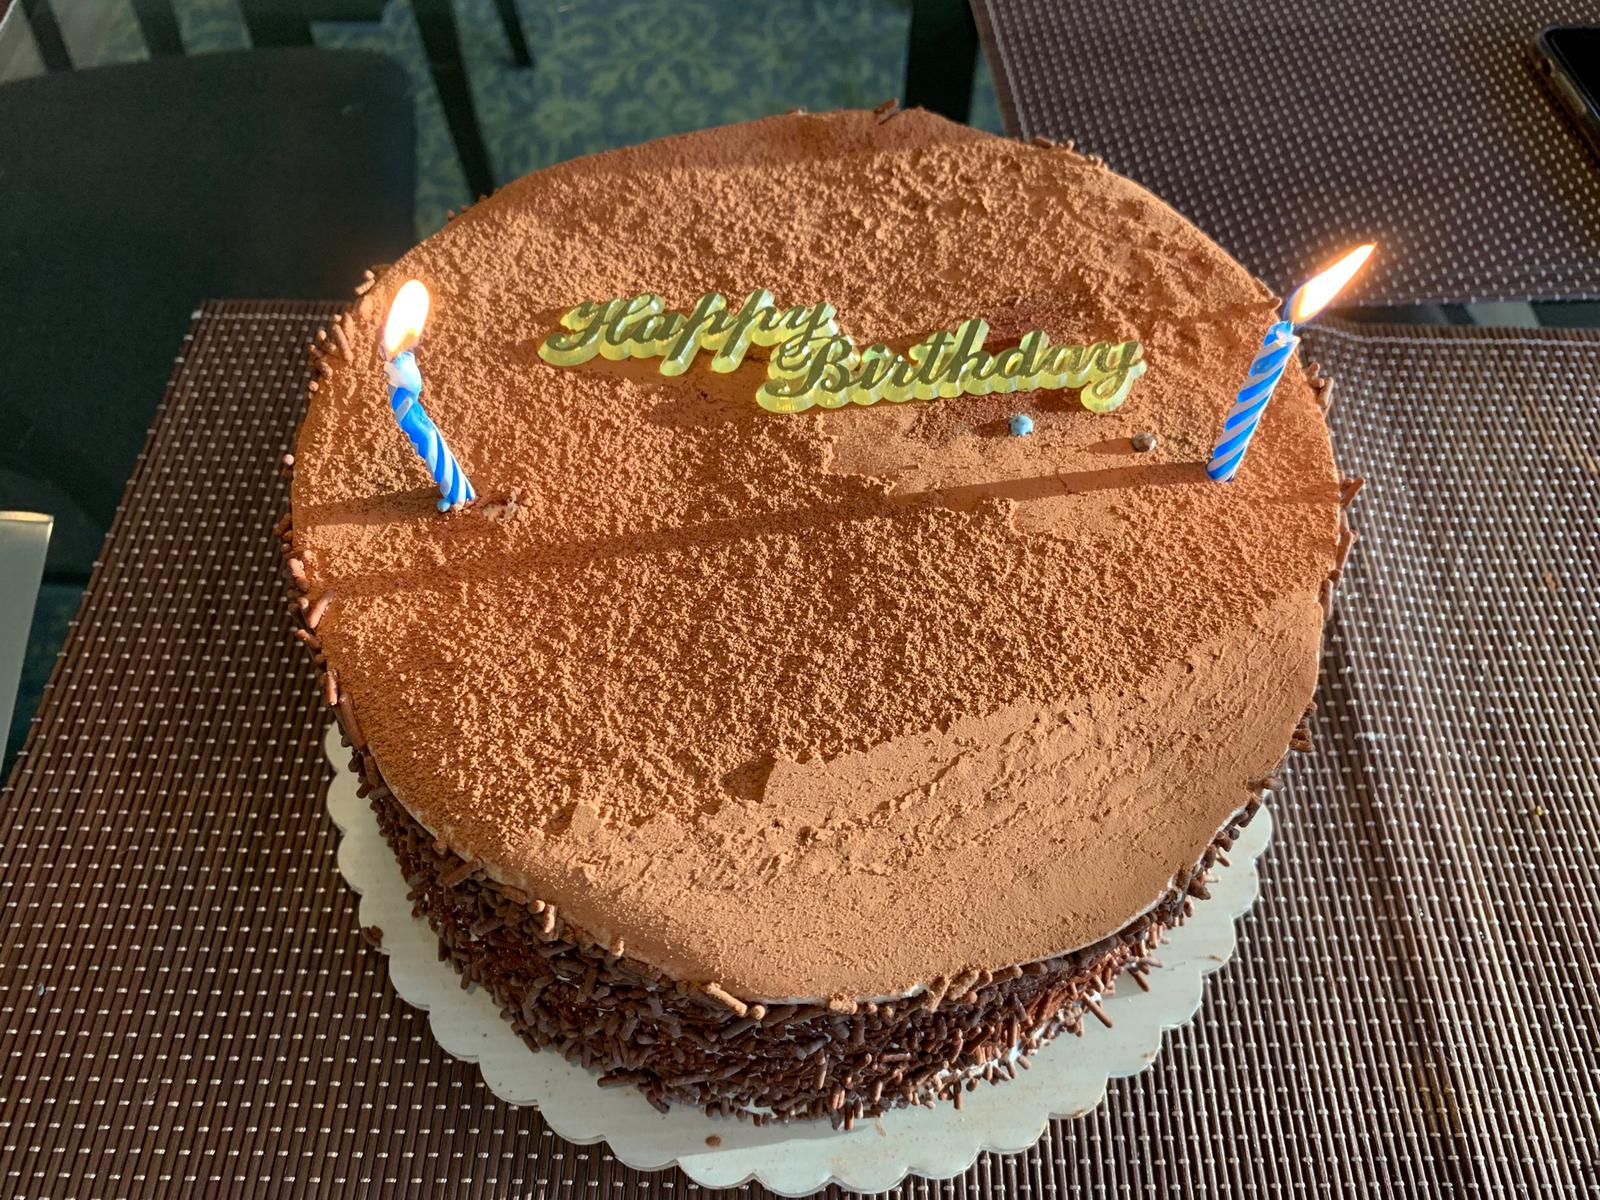 Superb Tiramisu Birthday Cake Wild Berries Bakery And Cafe Funny Birthday Cards Online Necthendildamsfinfo